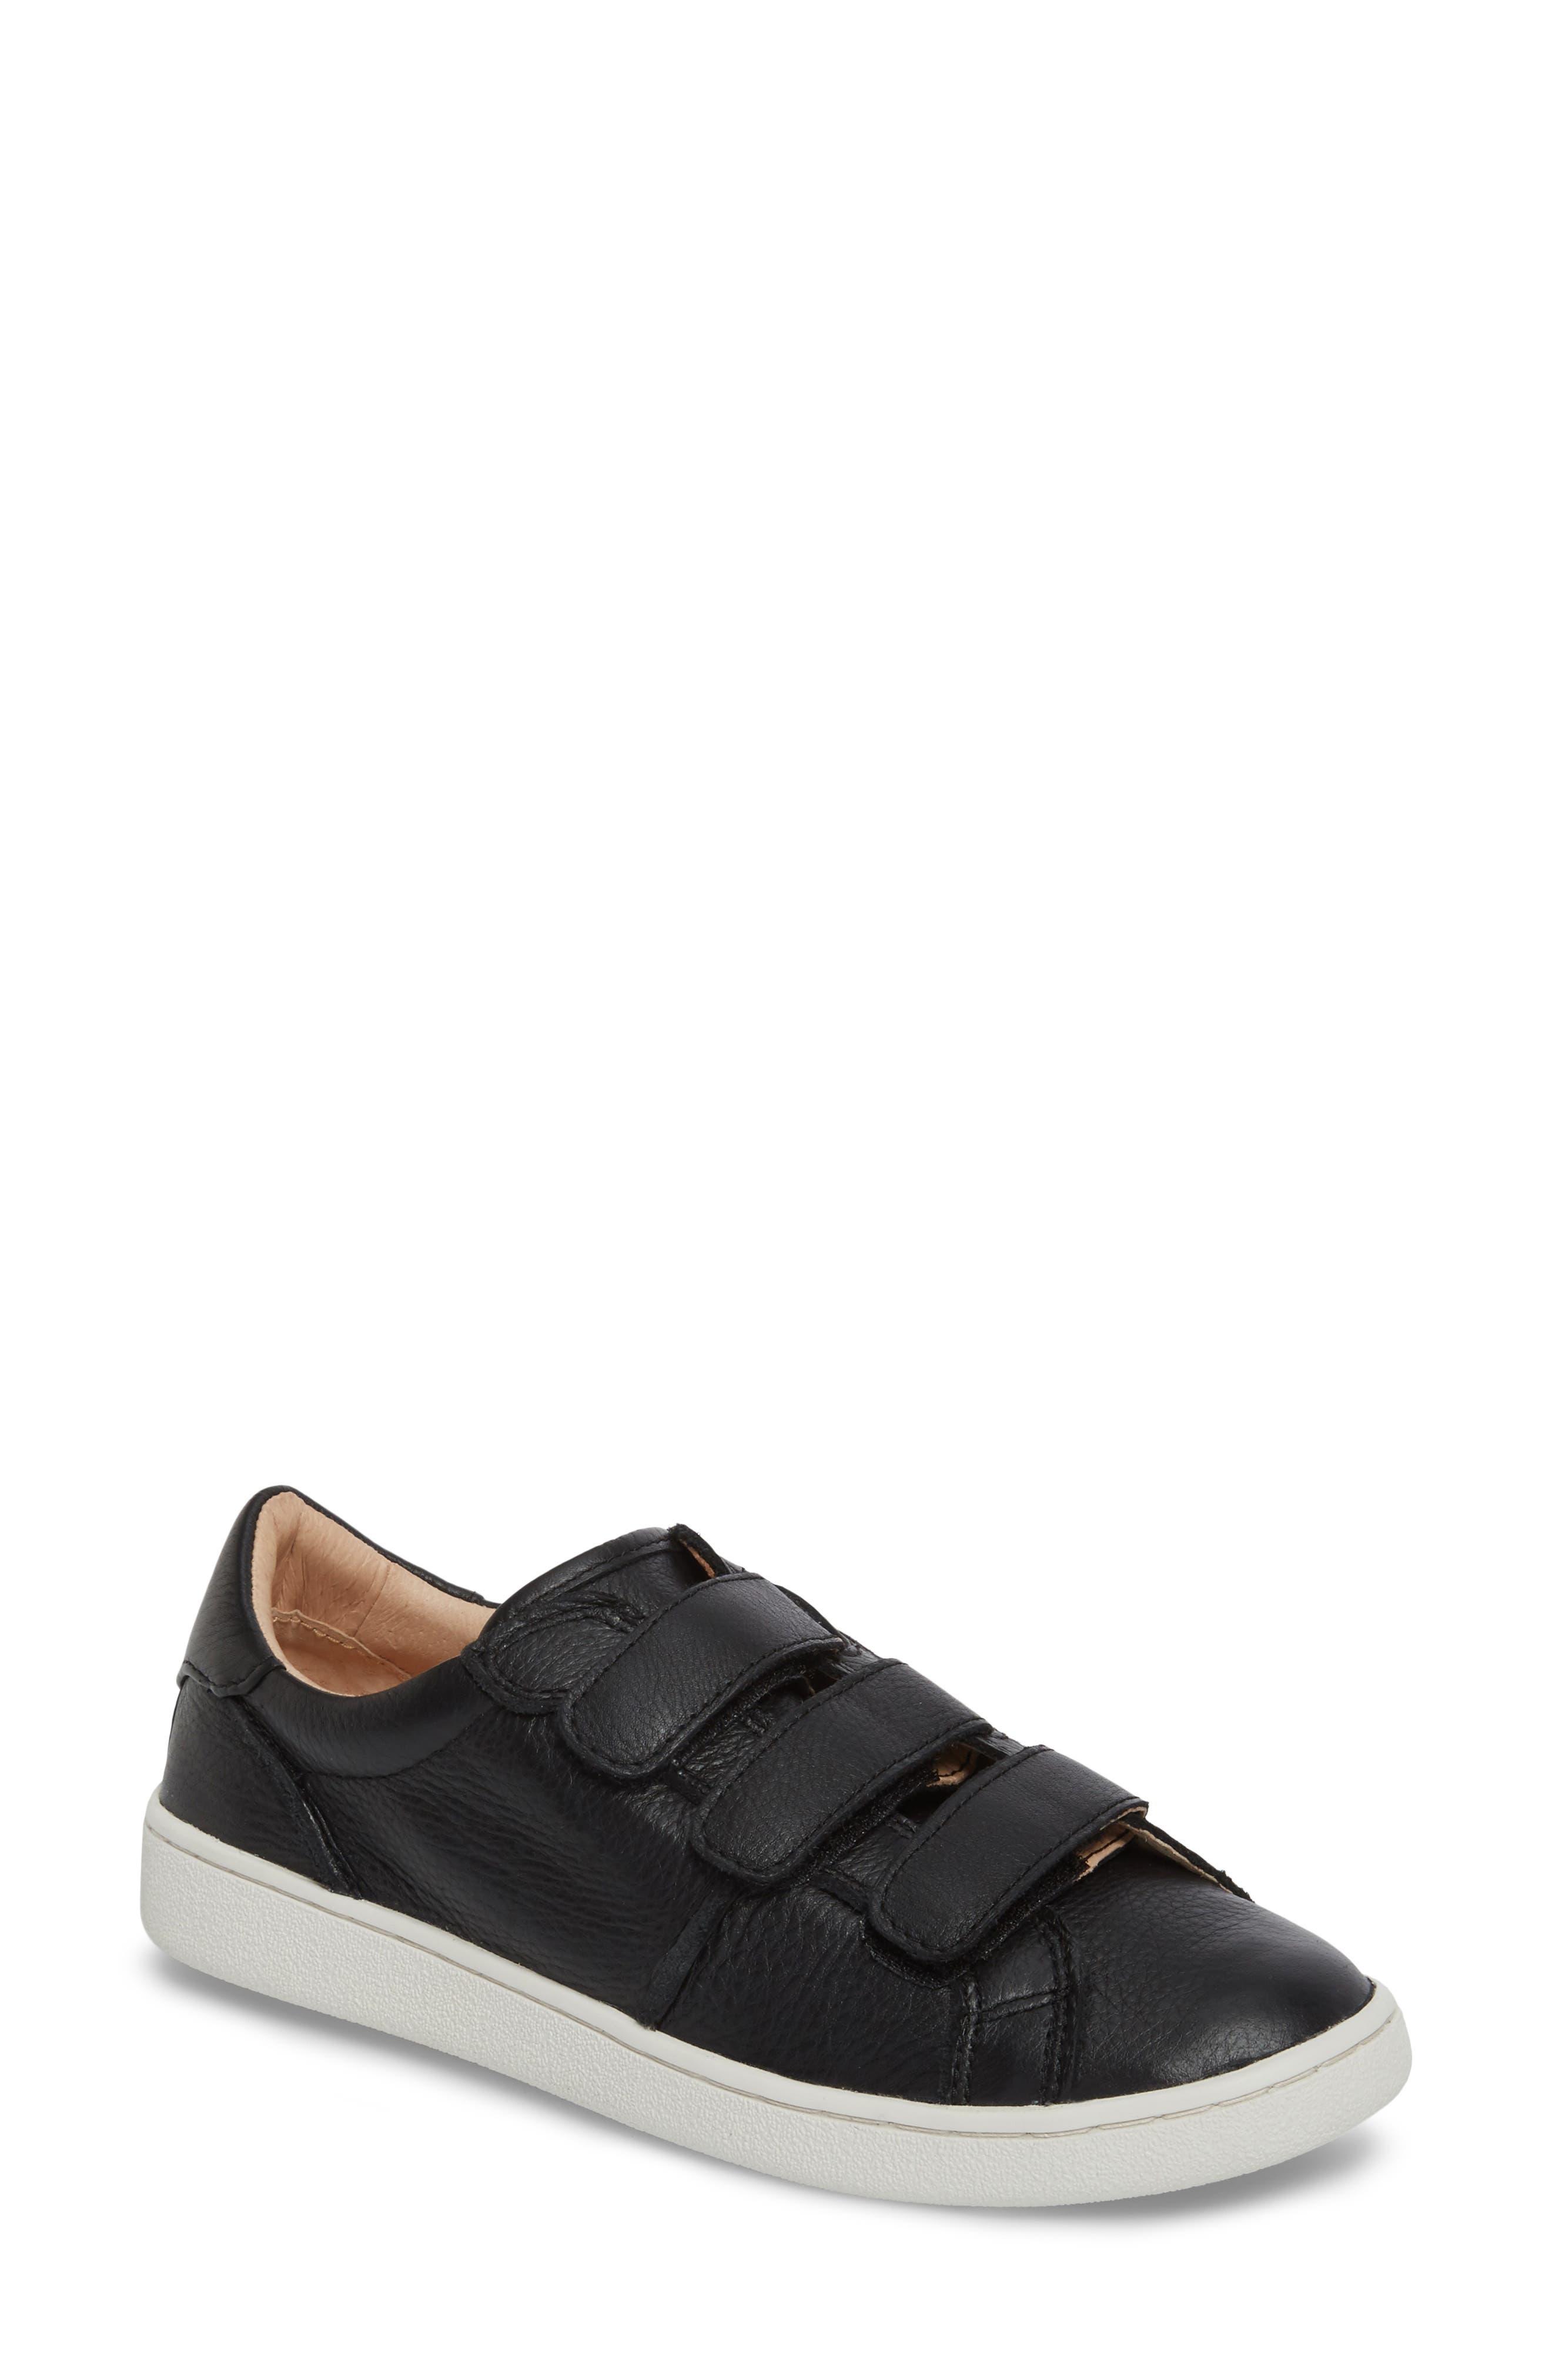 UGG<SUP>®</SUP>, Alix Sneaker, Main thumbnail 1, color, 001